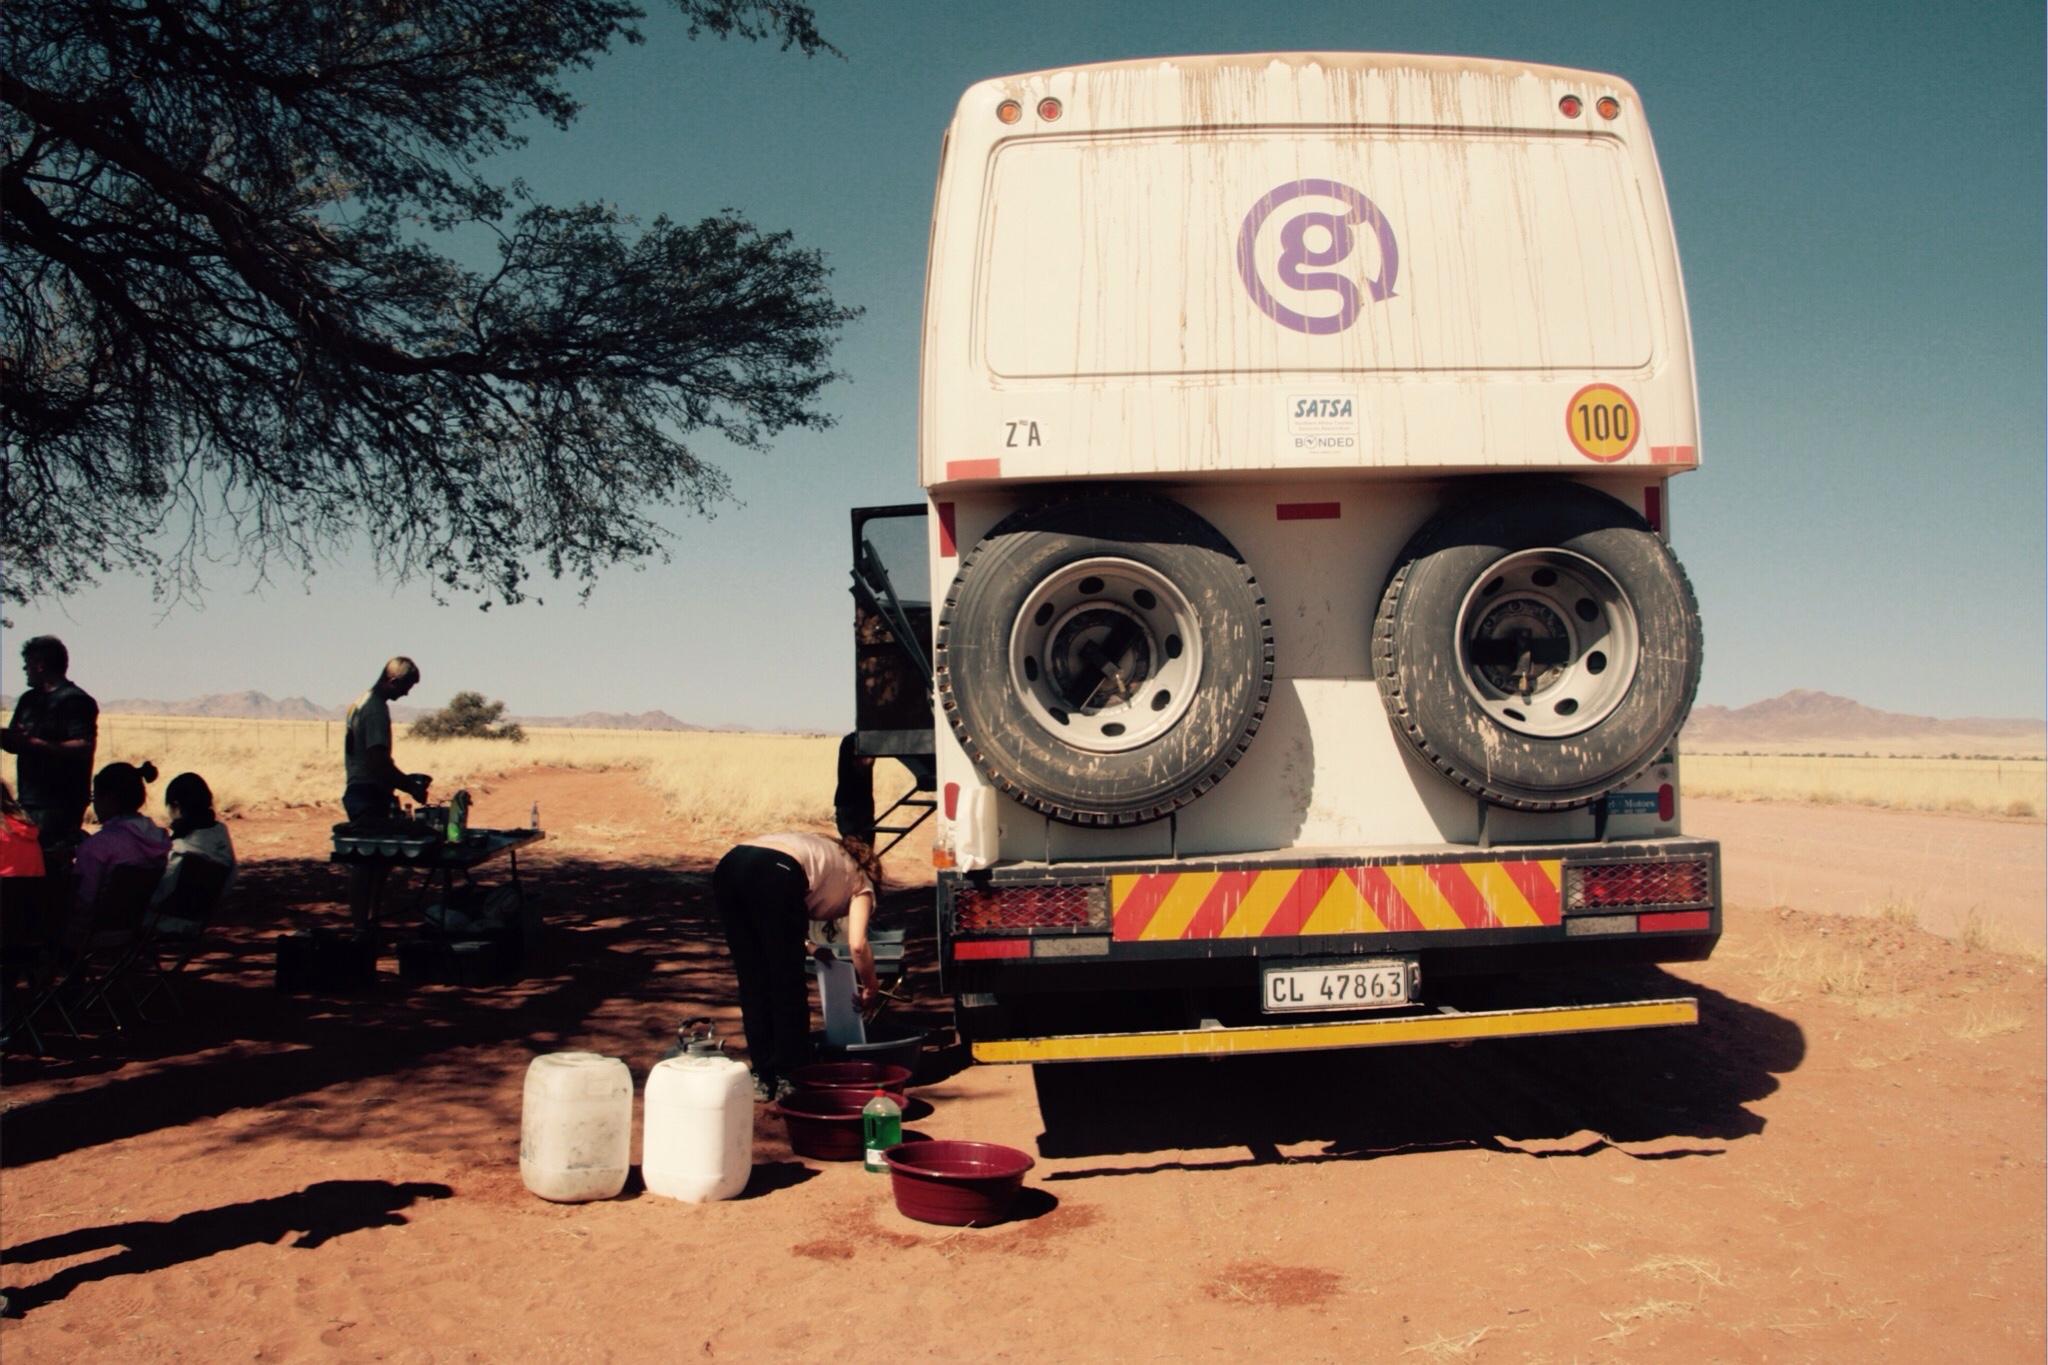 Mittagspause in der Namib, Namibia, Afrika, Overlanding, G-Adventures